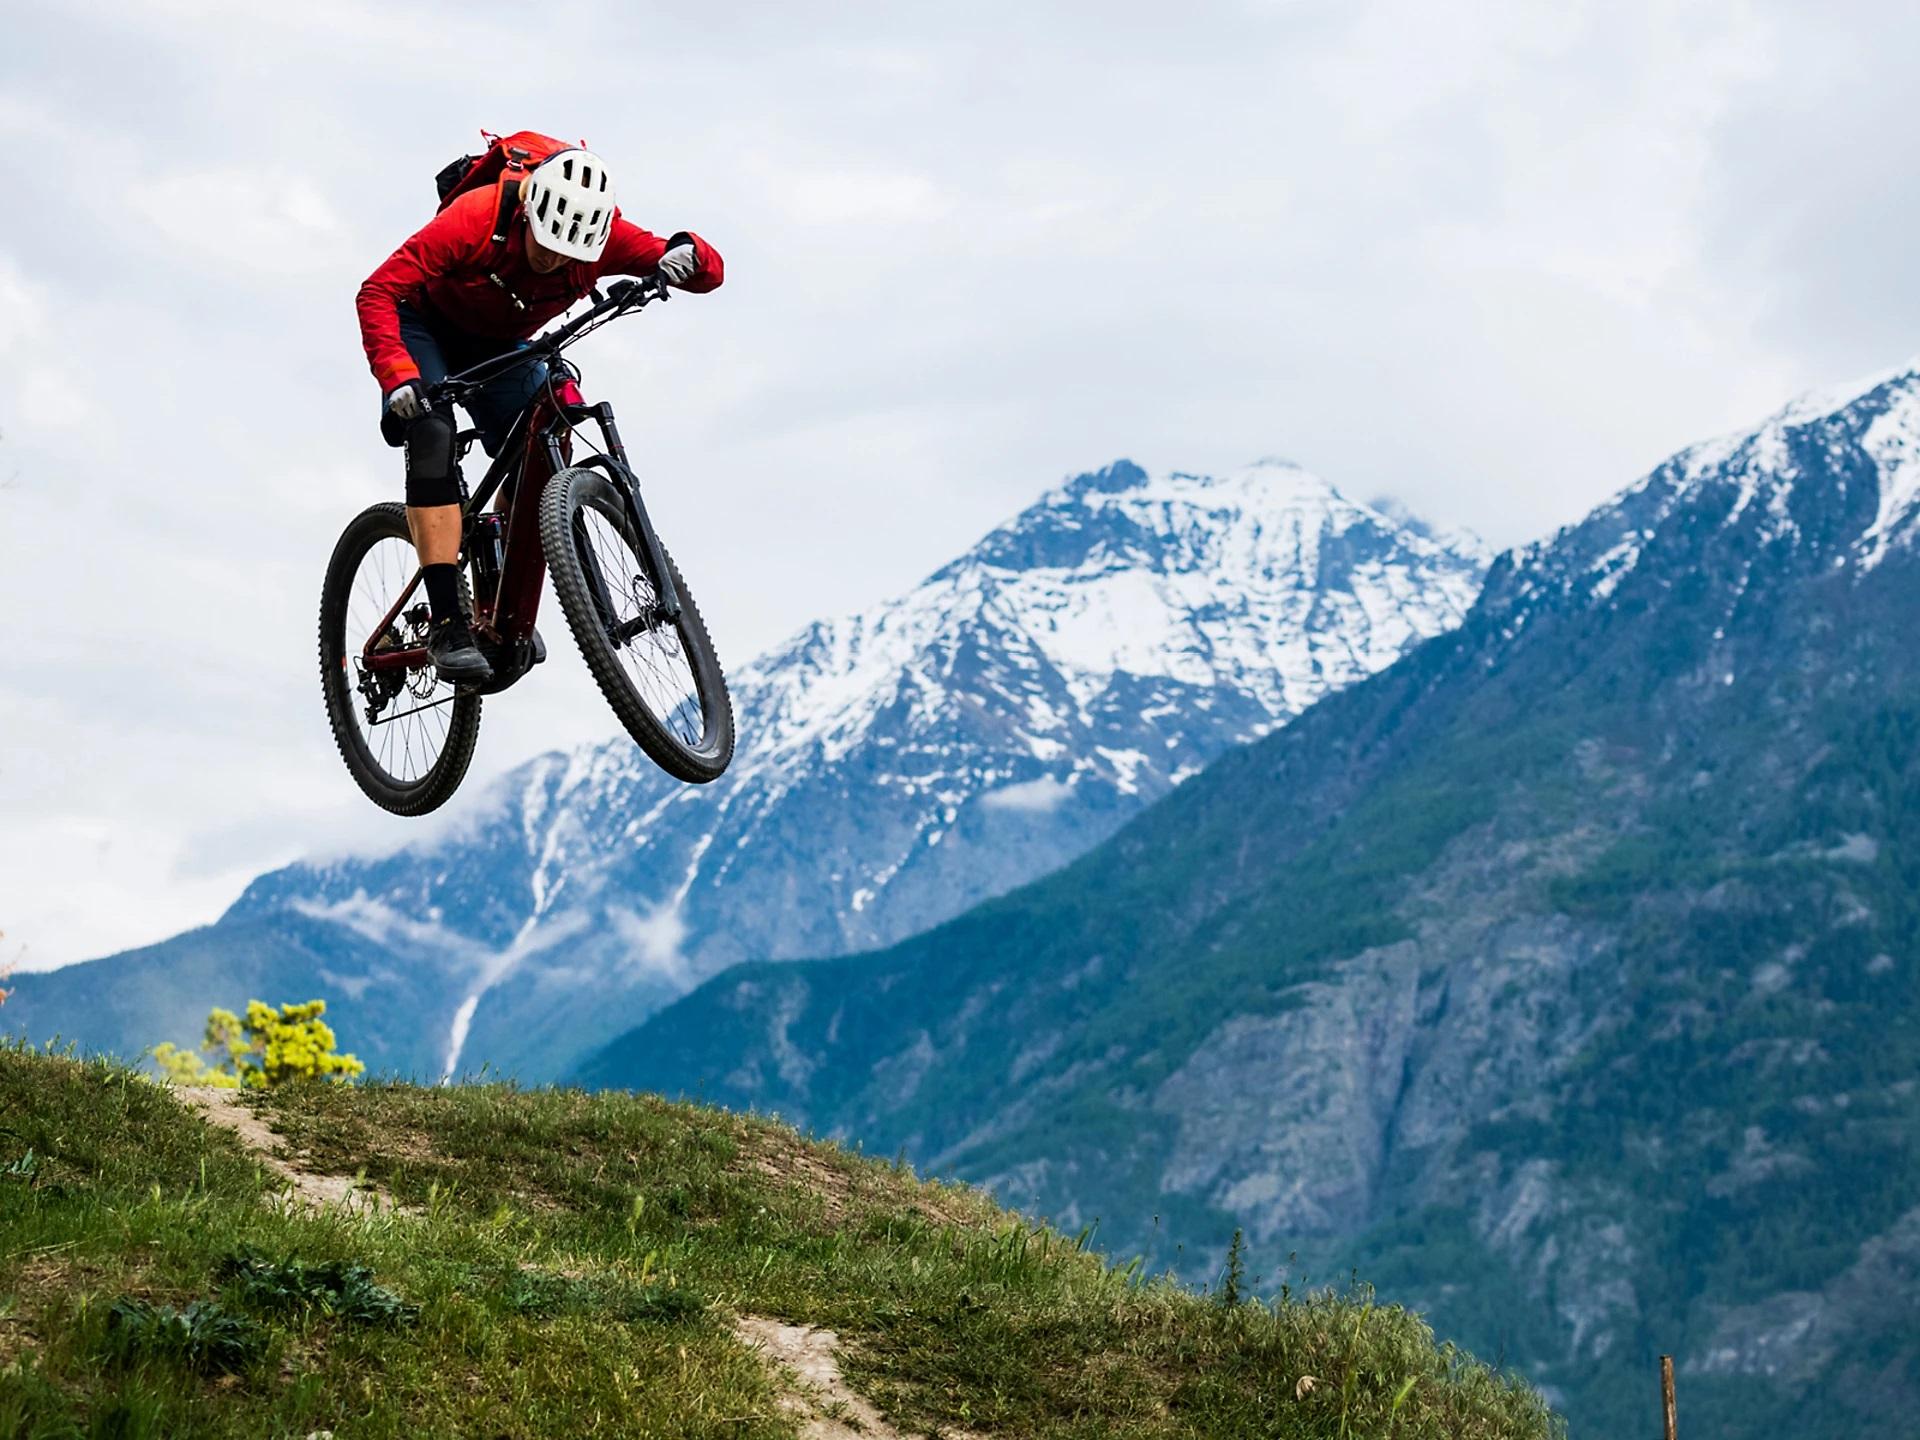 Trek Bikes Reliability and Durability